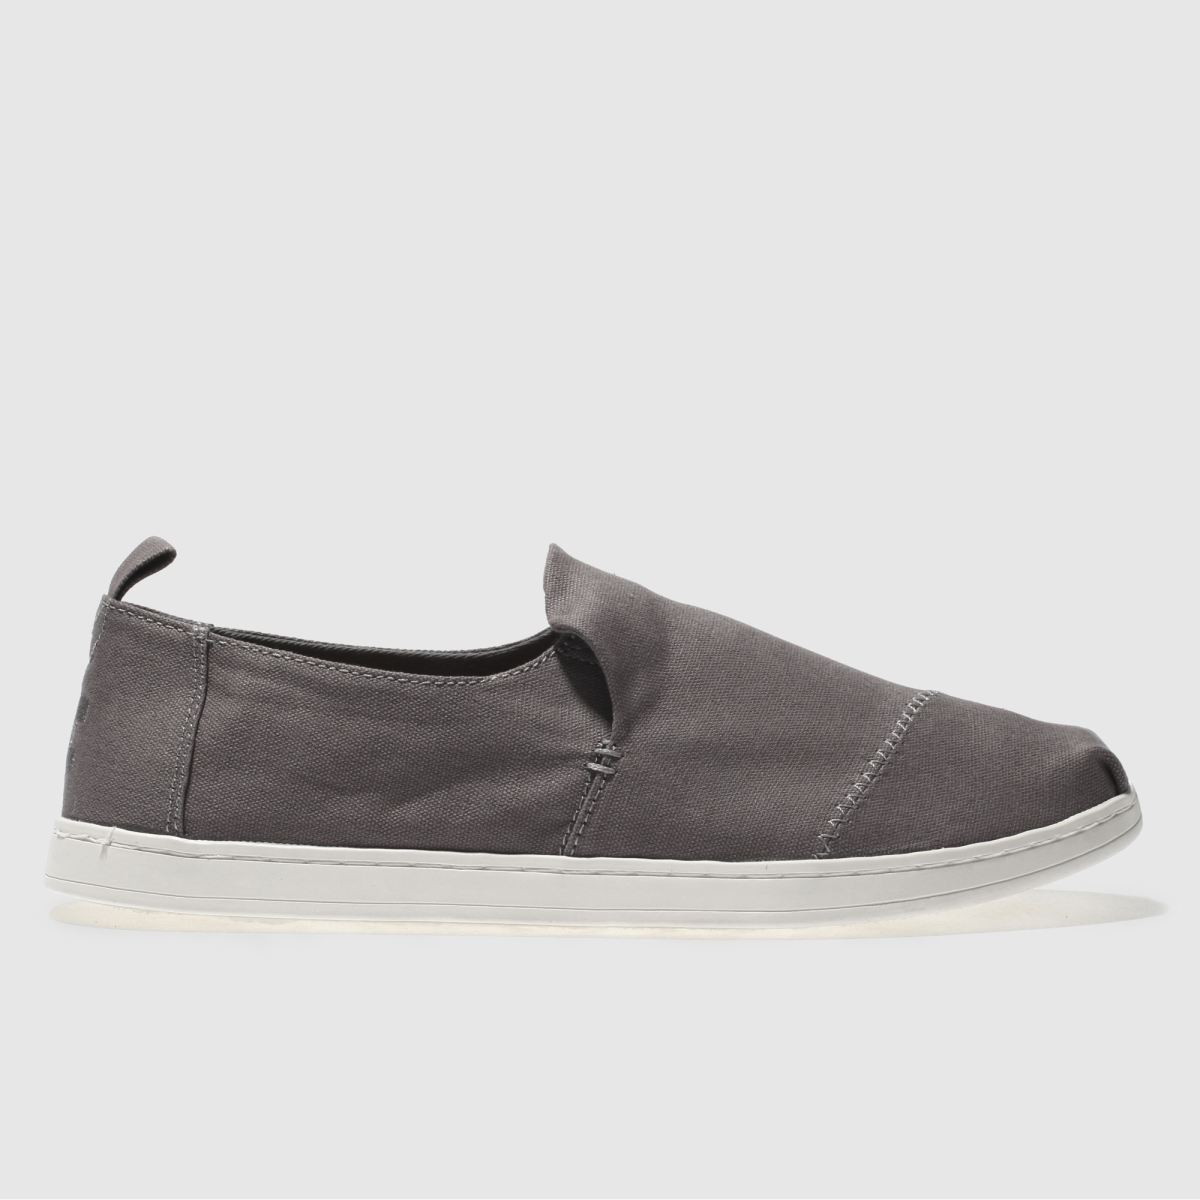 Toms Grey Deconstructed Alpargata Shoes